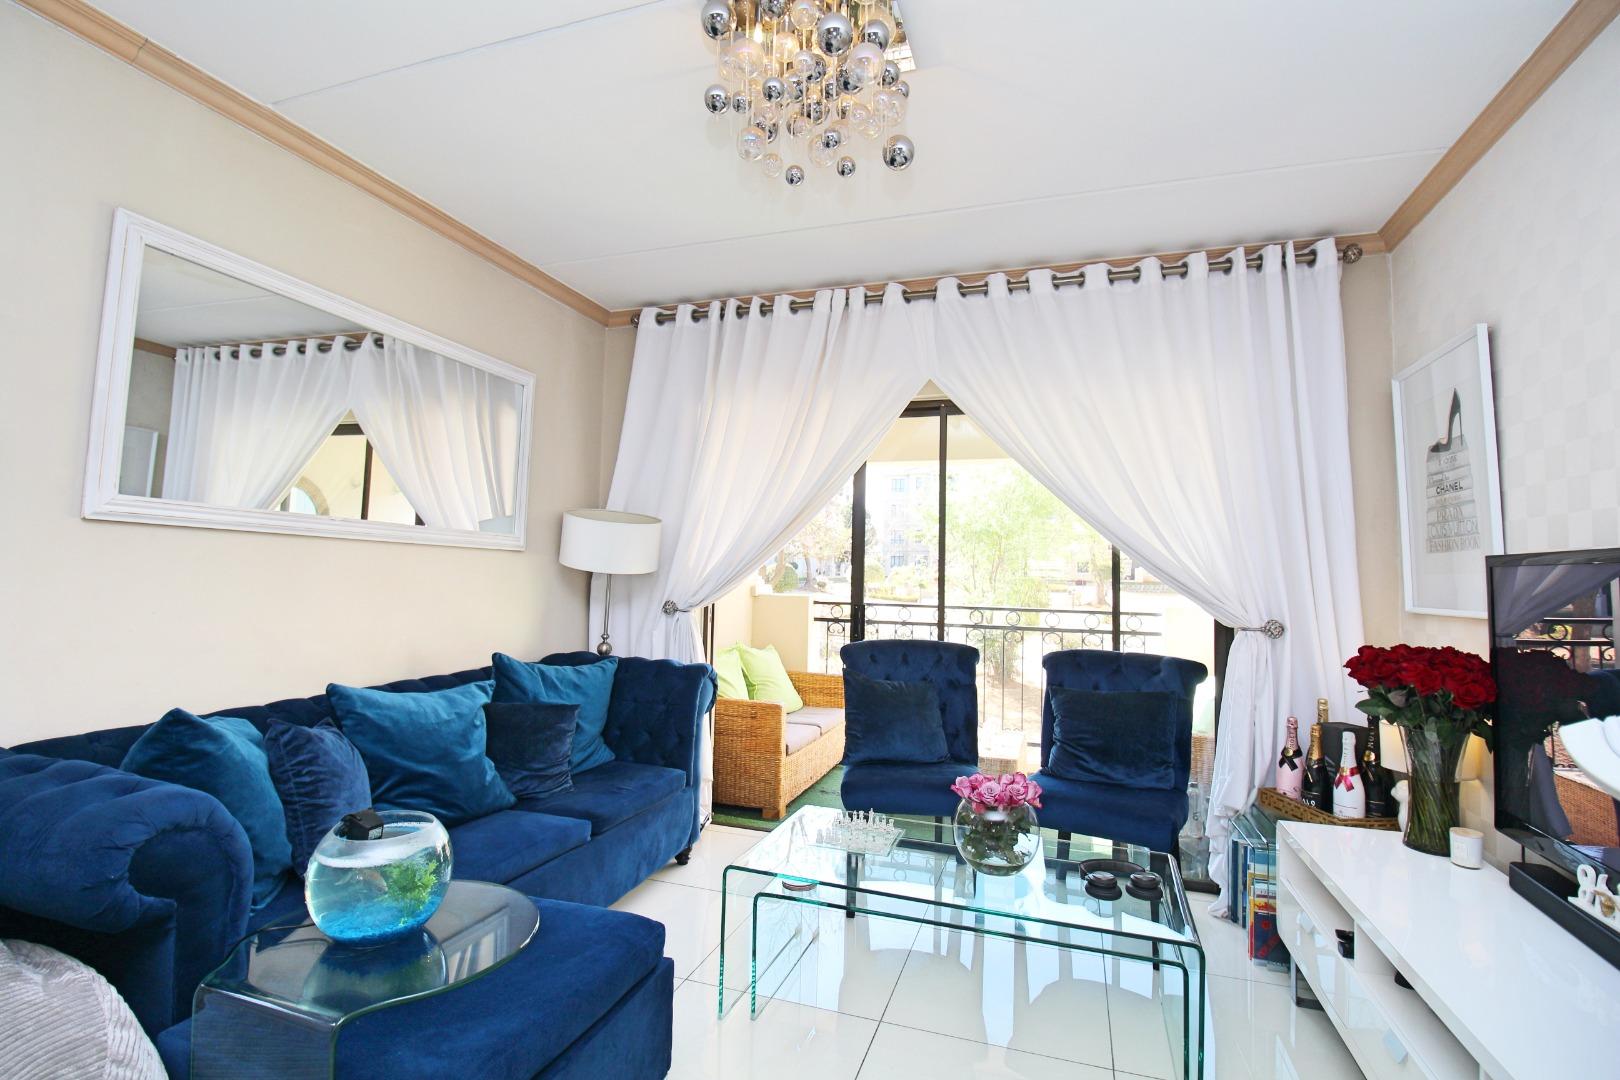 1 Bedroom Apartment / Flat To Rent in Noordwyk